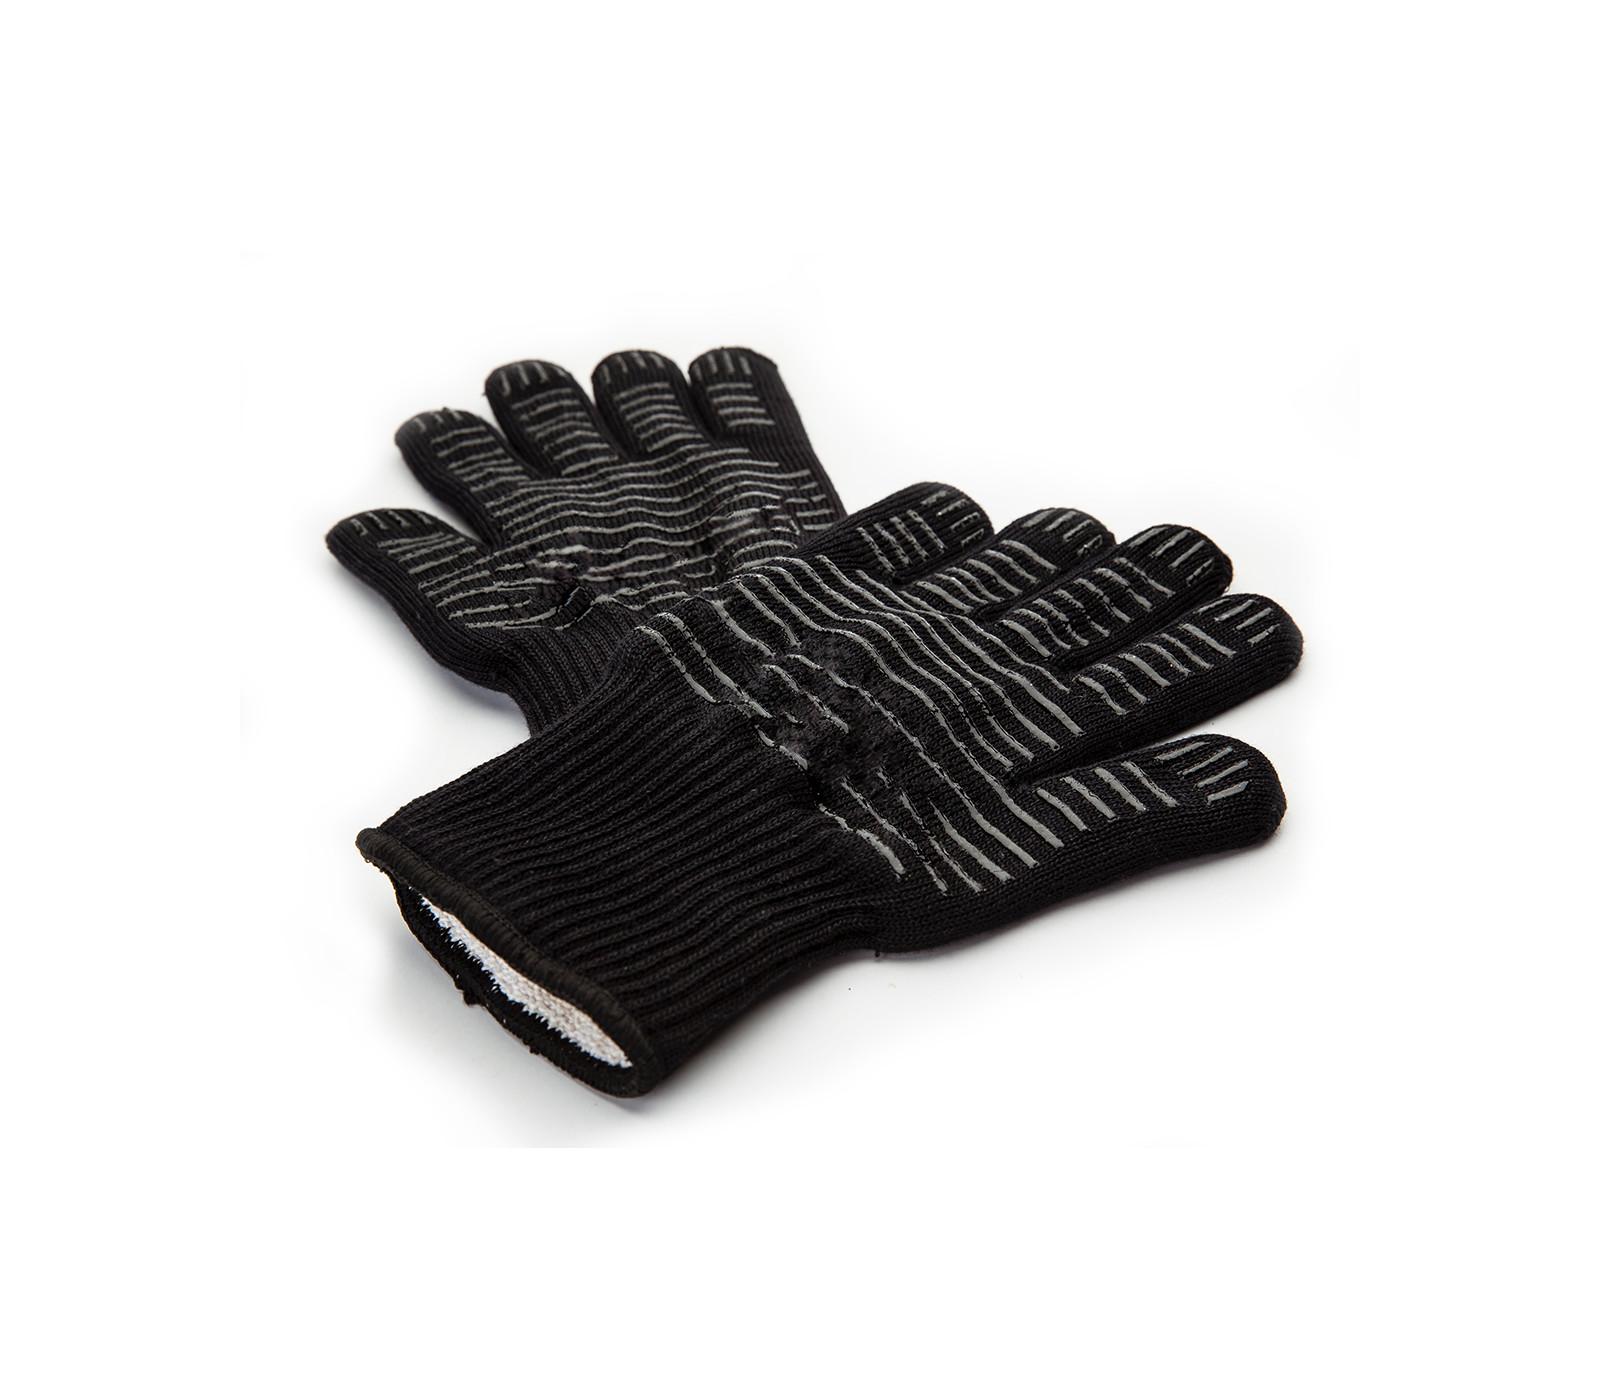 Grill Guru High Heat Gloves